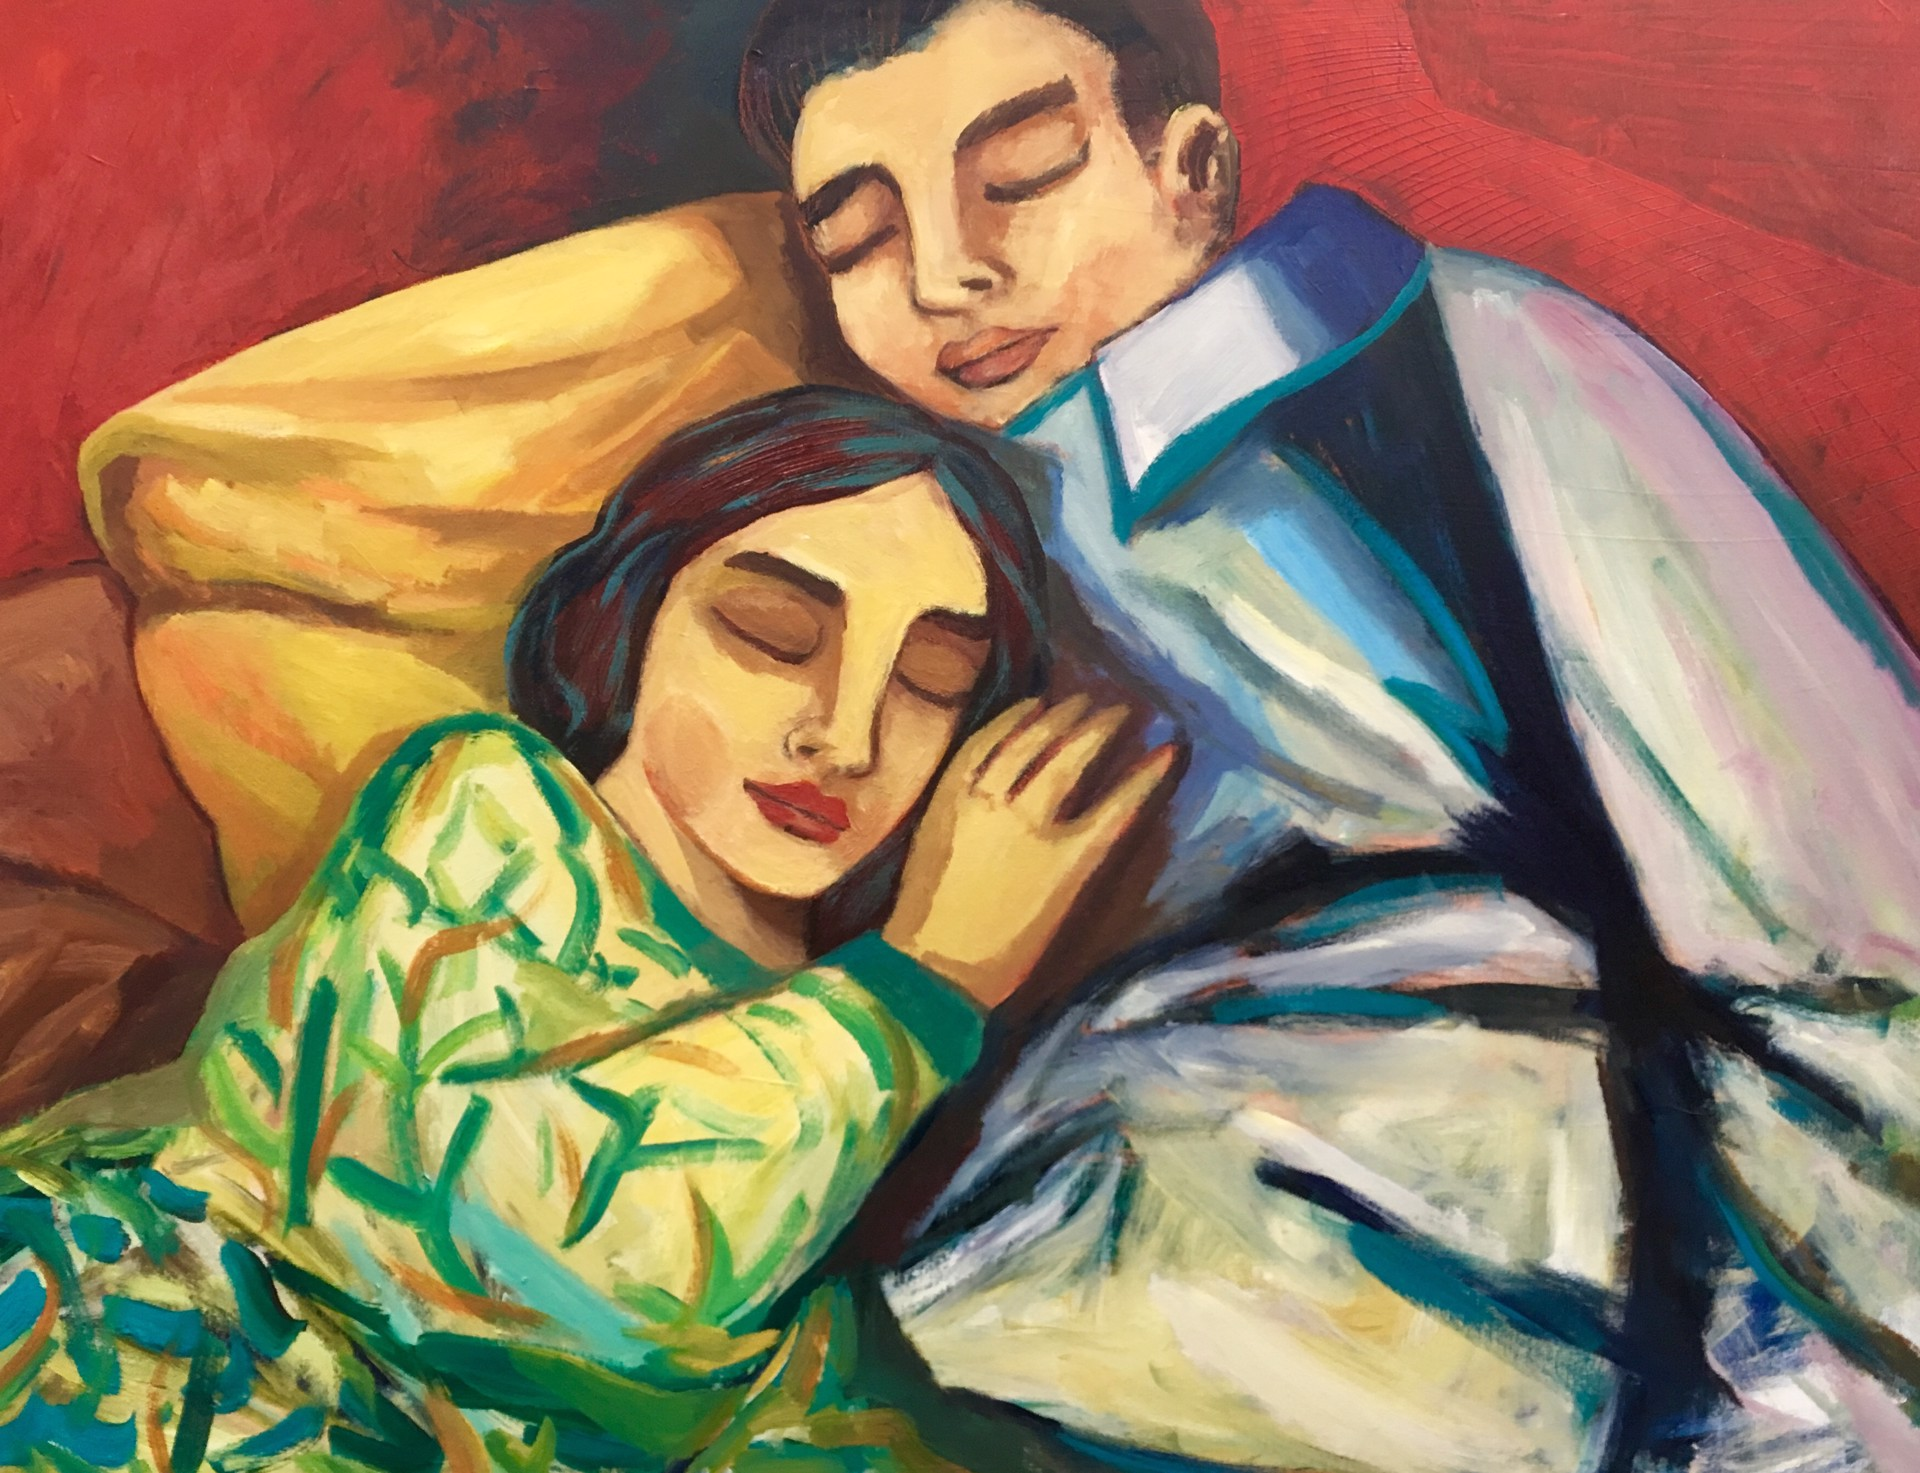 My Sweet Earthen Shelter by William Hernandez